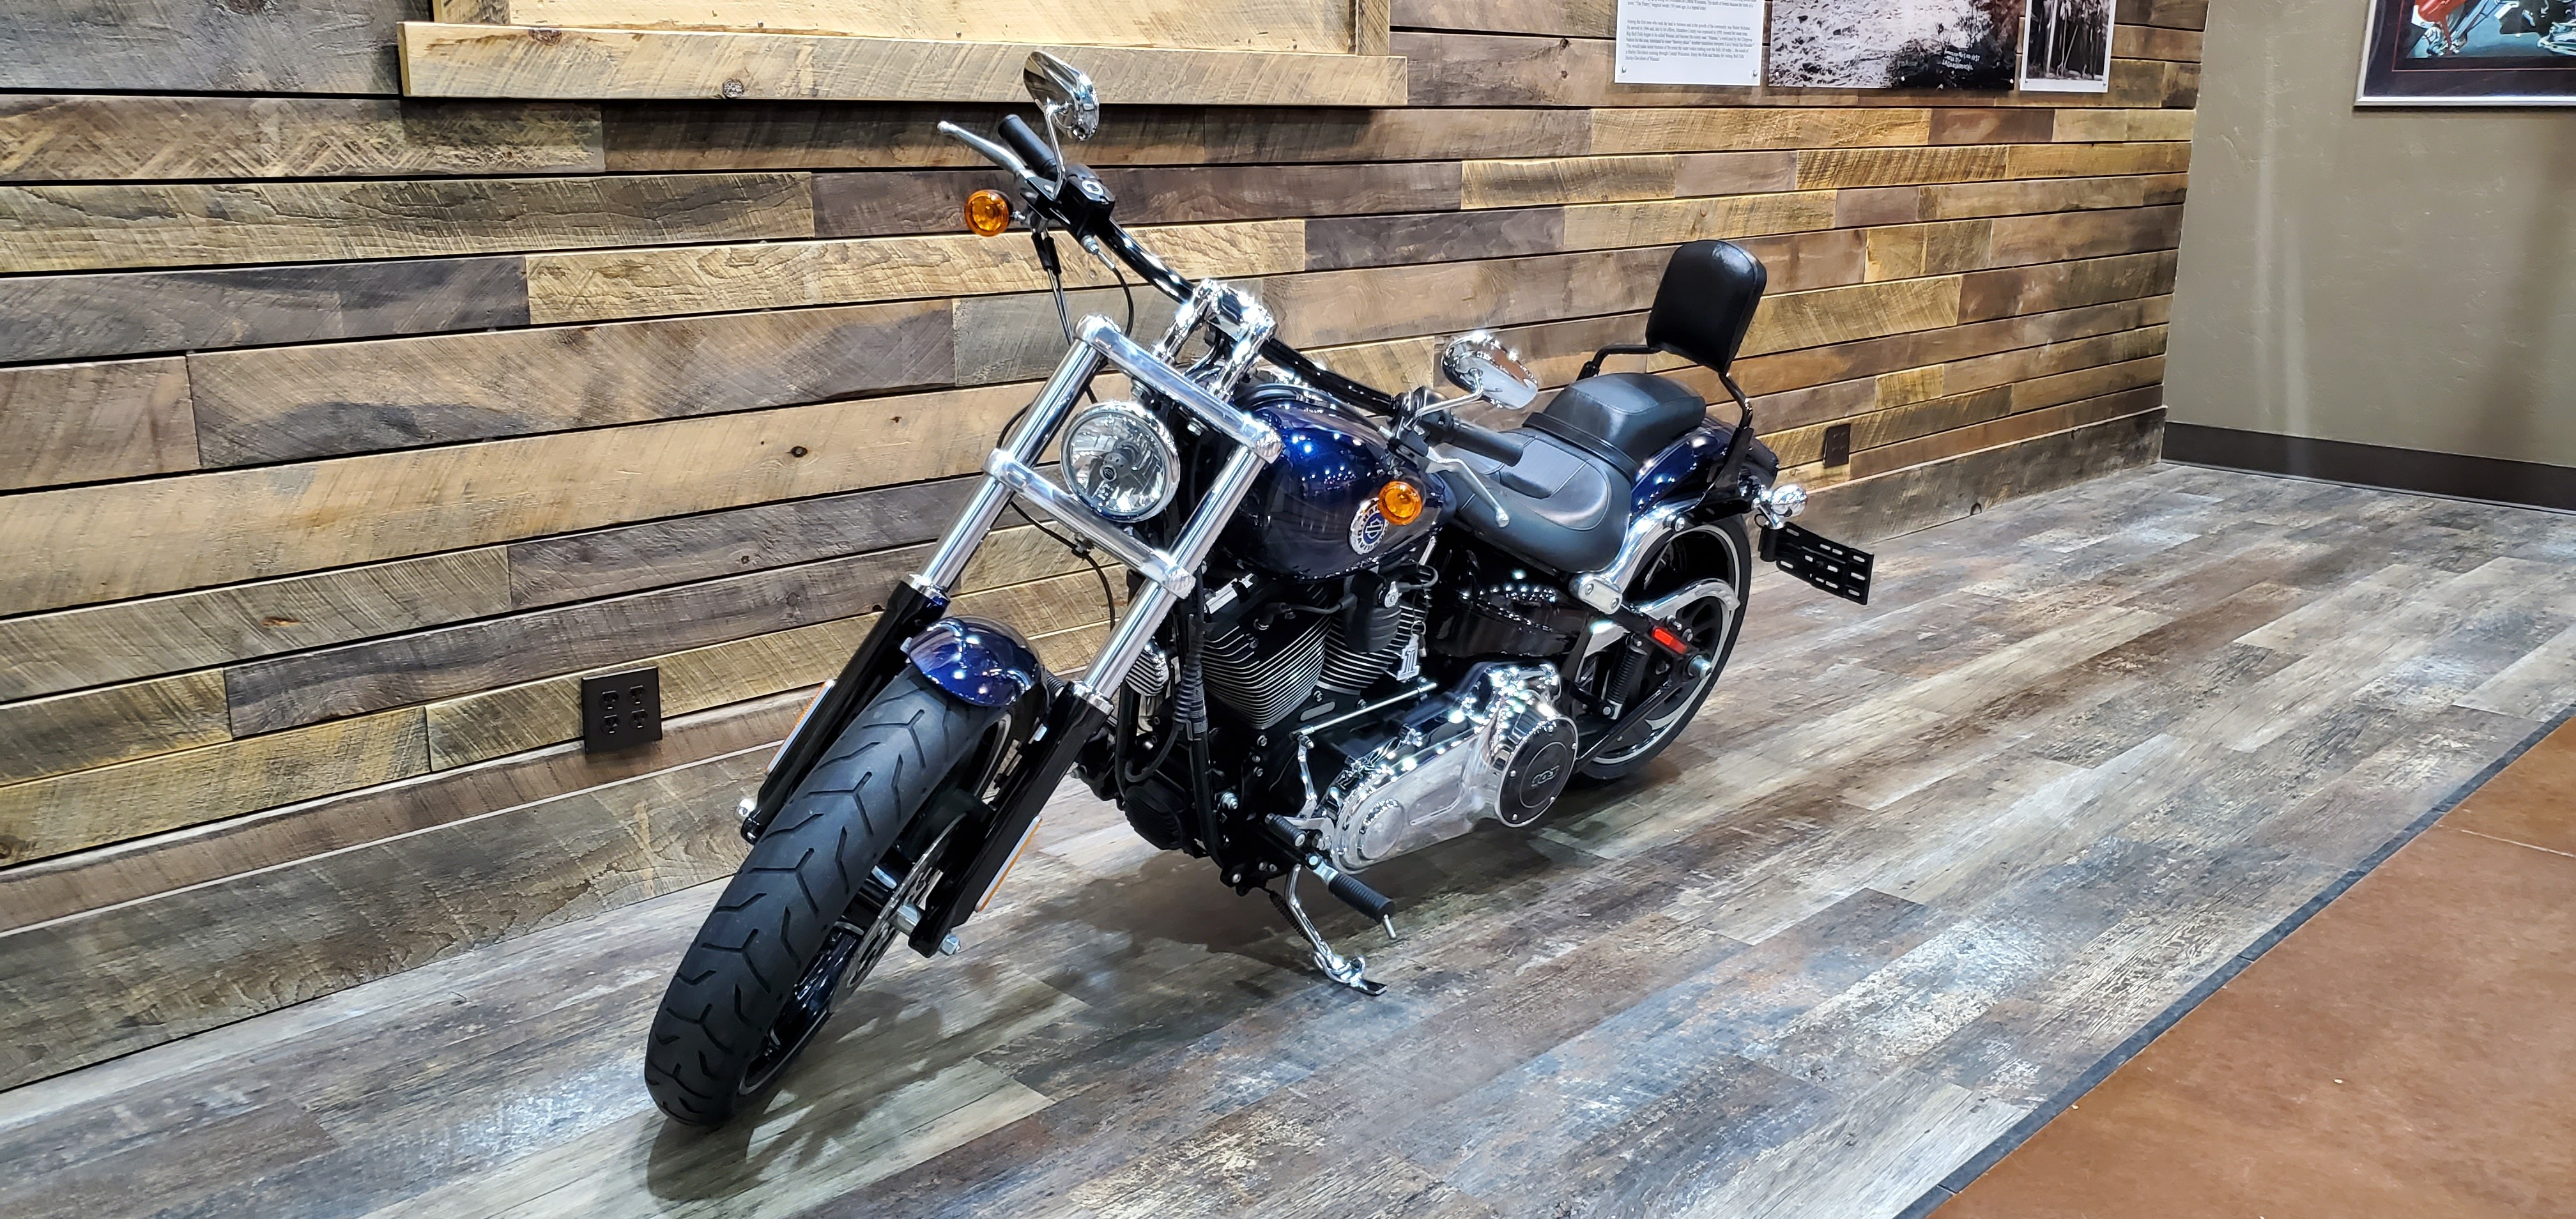 2013 Harley-Davidson Softail Breakout at Bull Falls Harley-Davidson